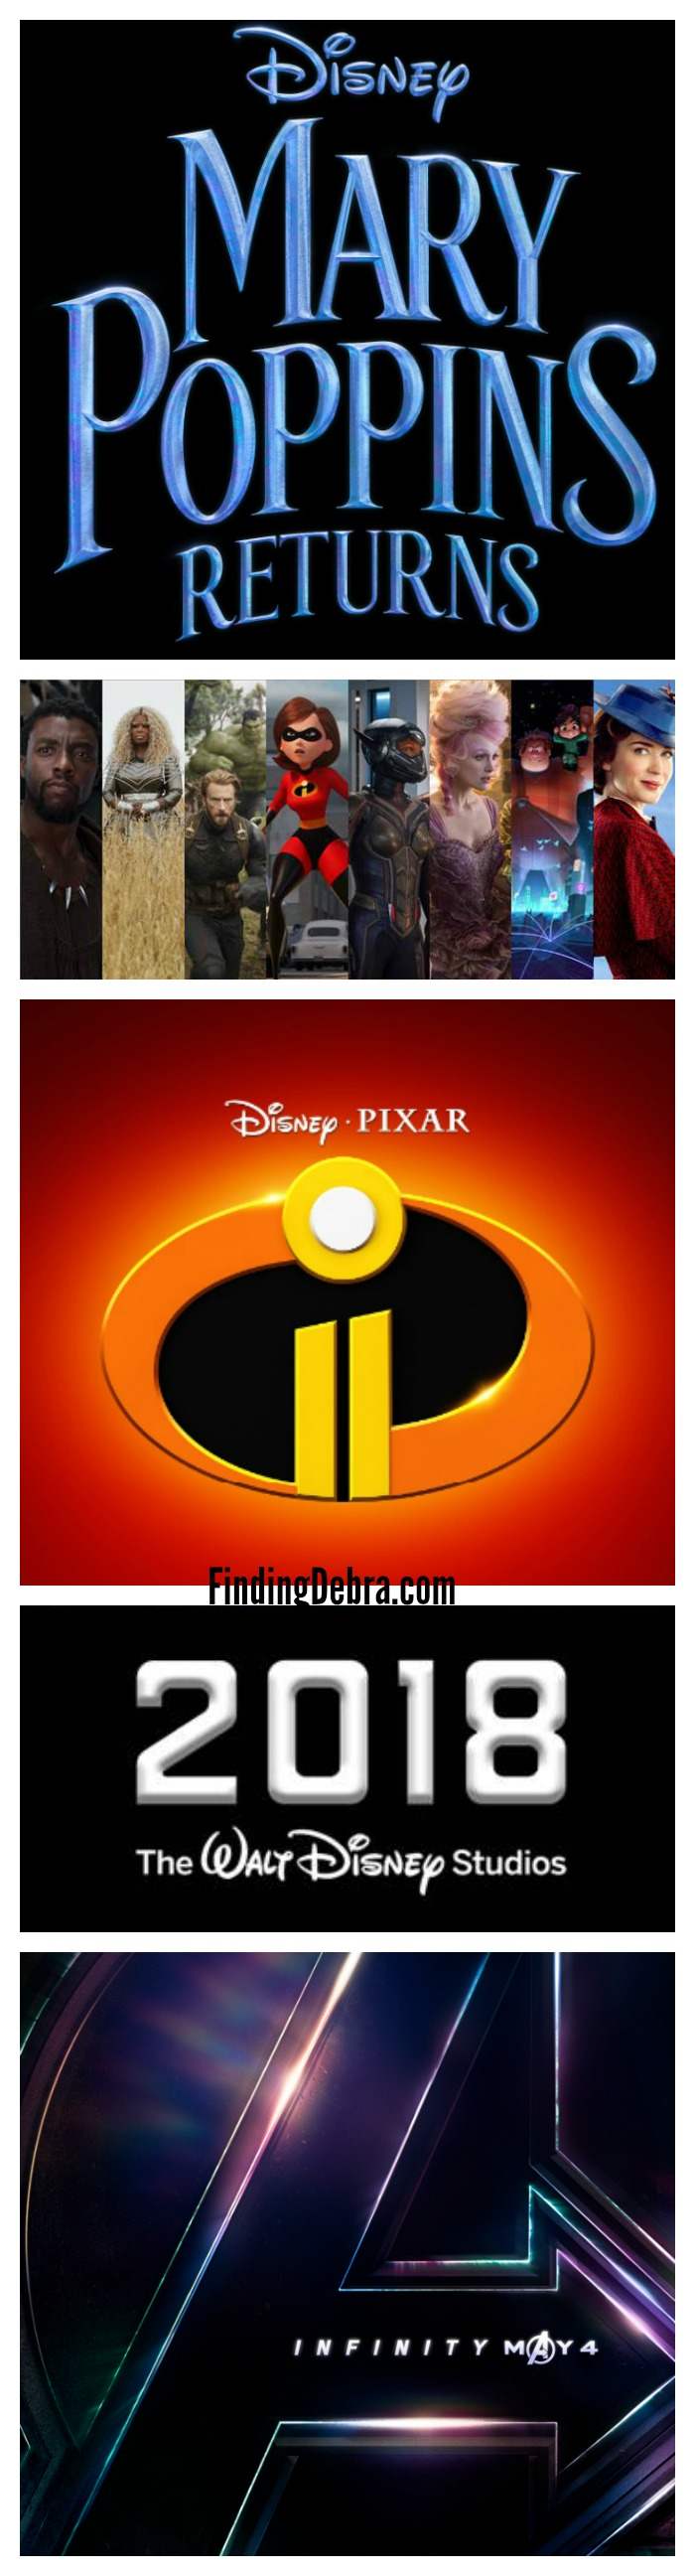 2018 Disney Movies Slate